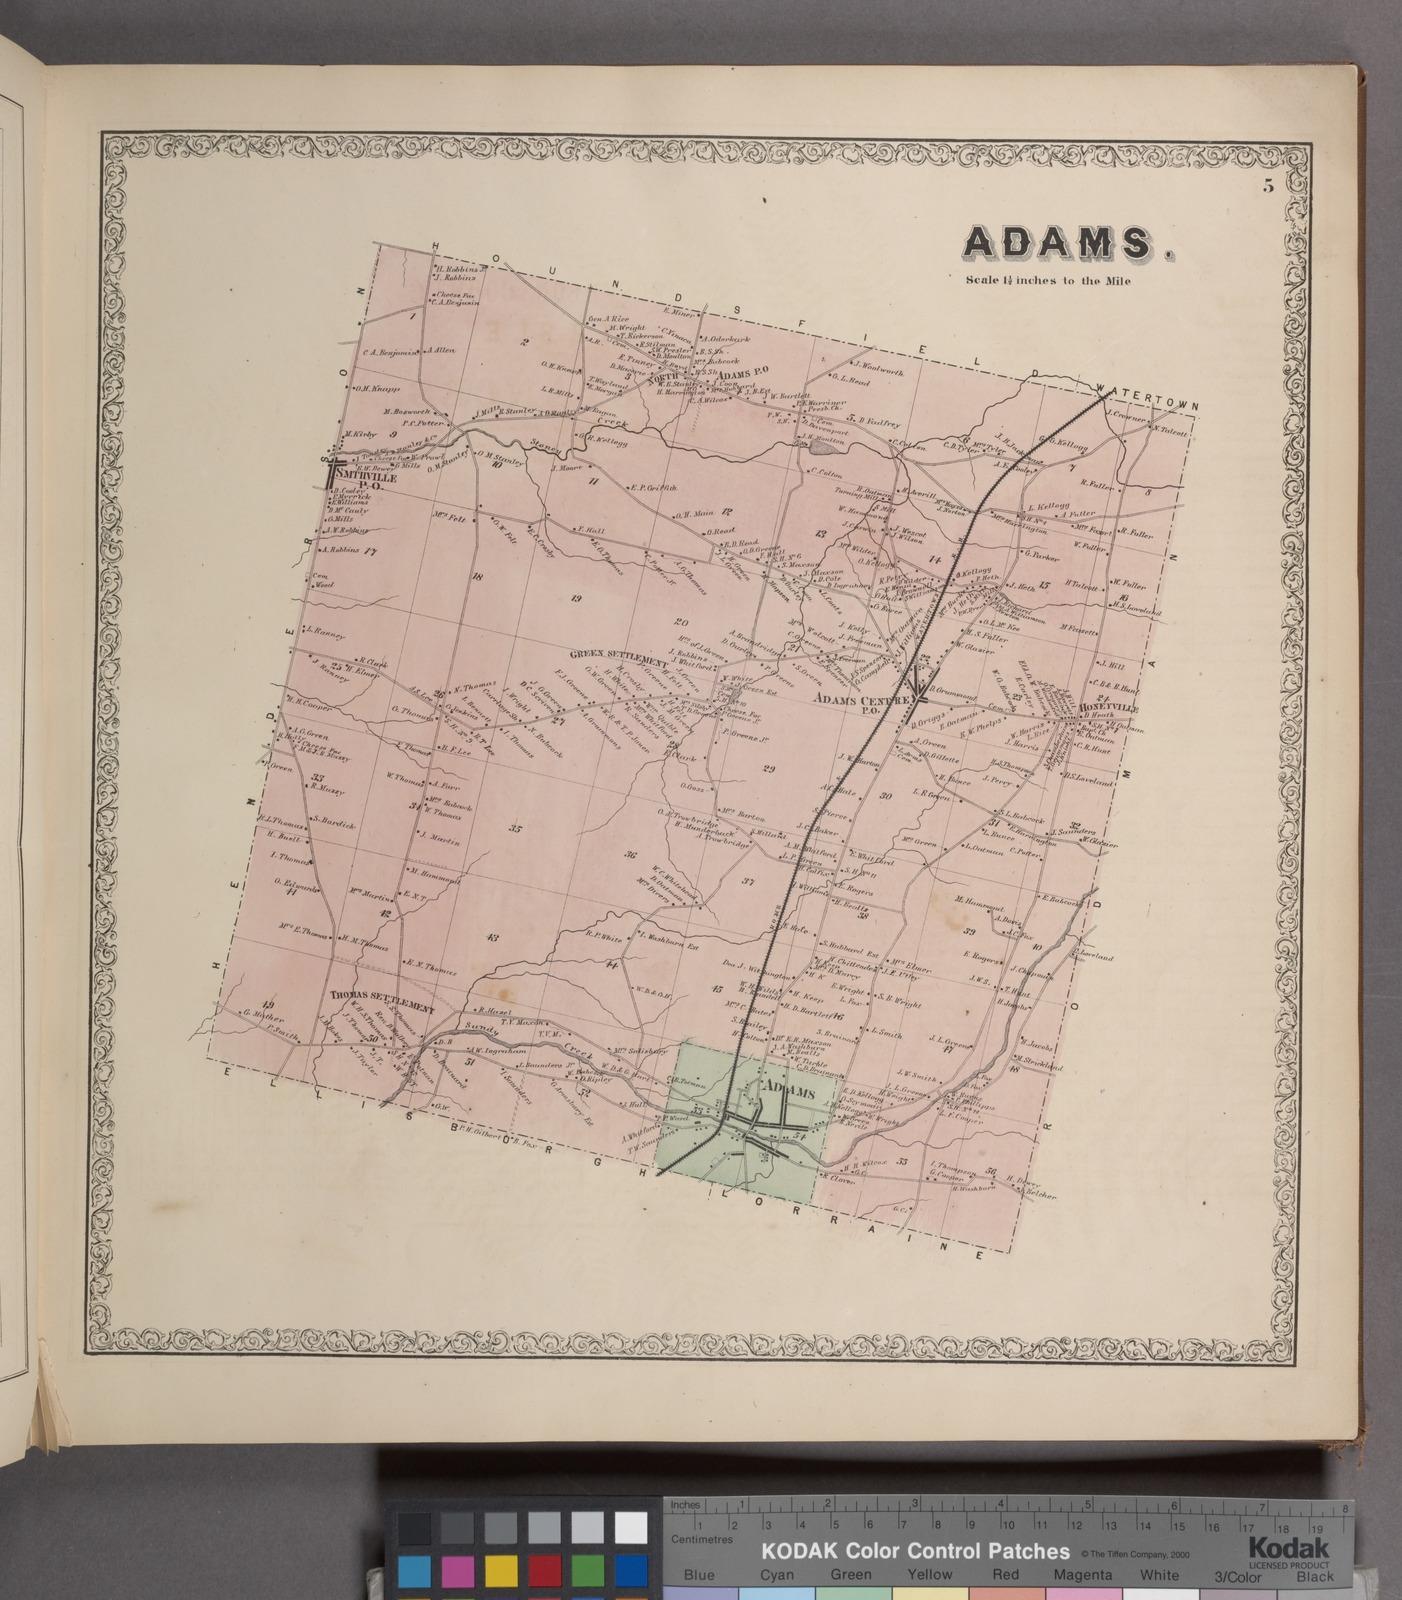 Adams. [Township]